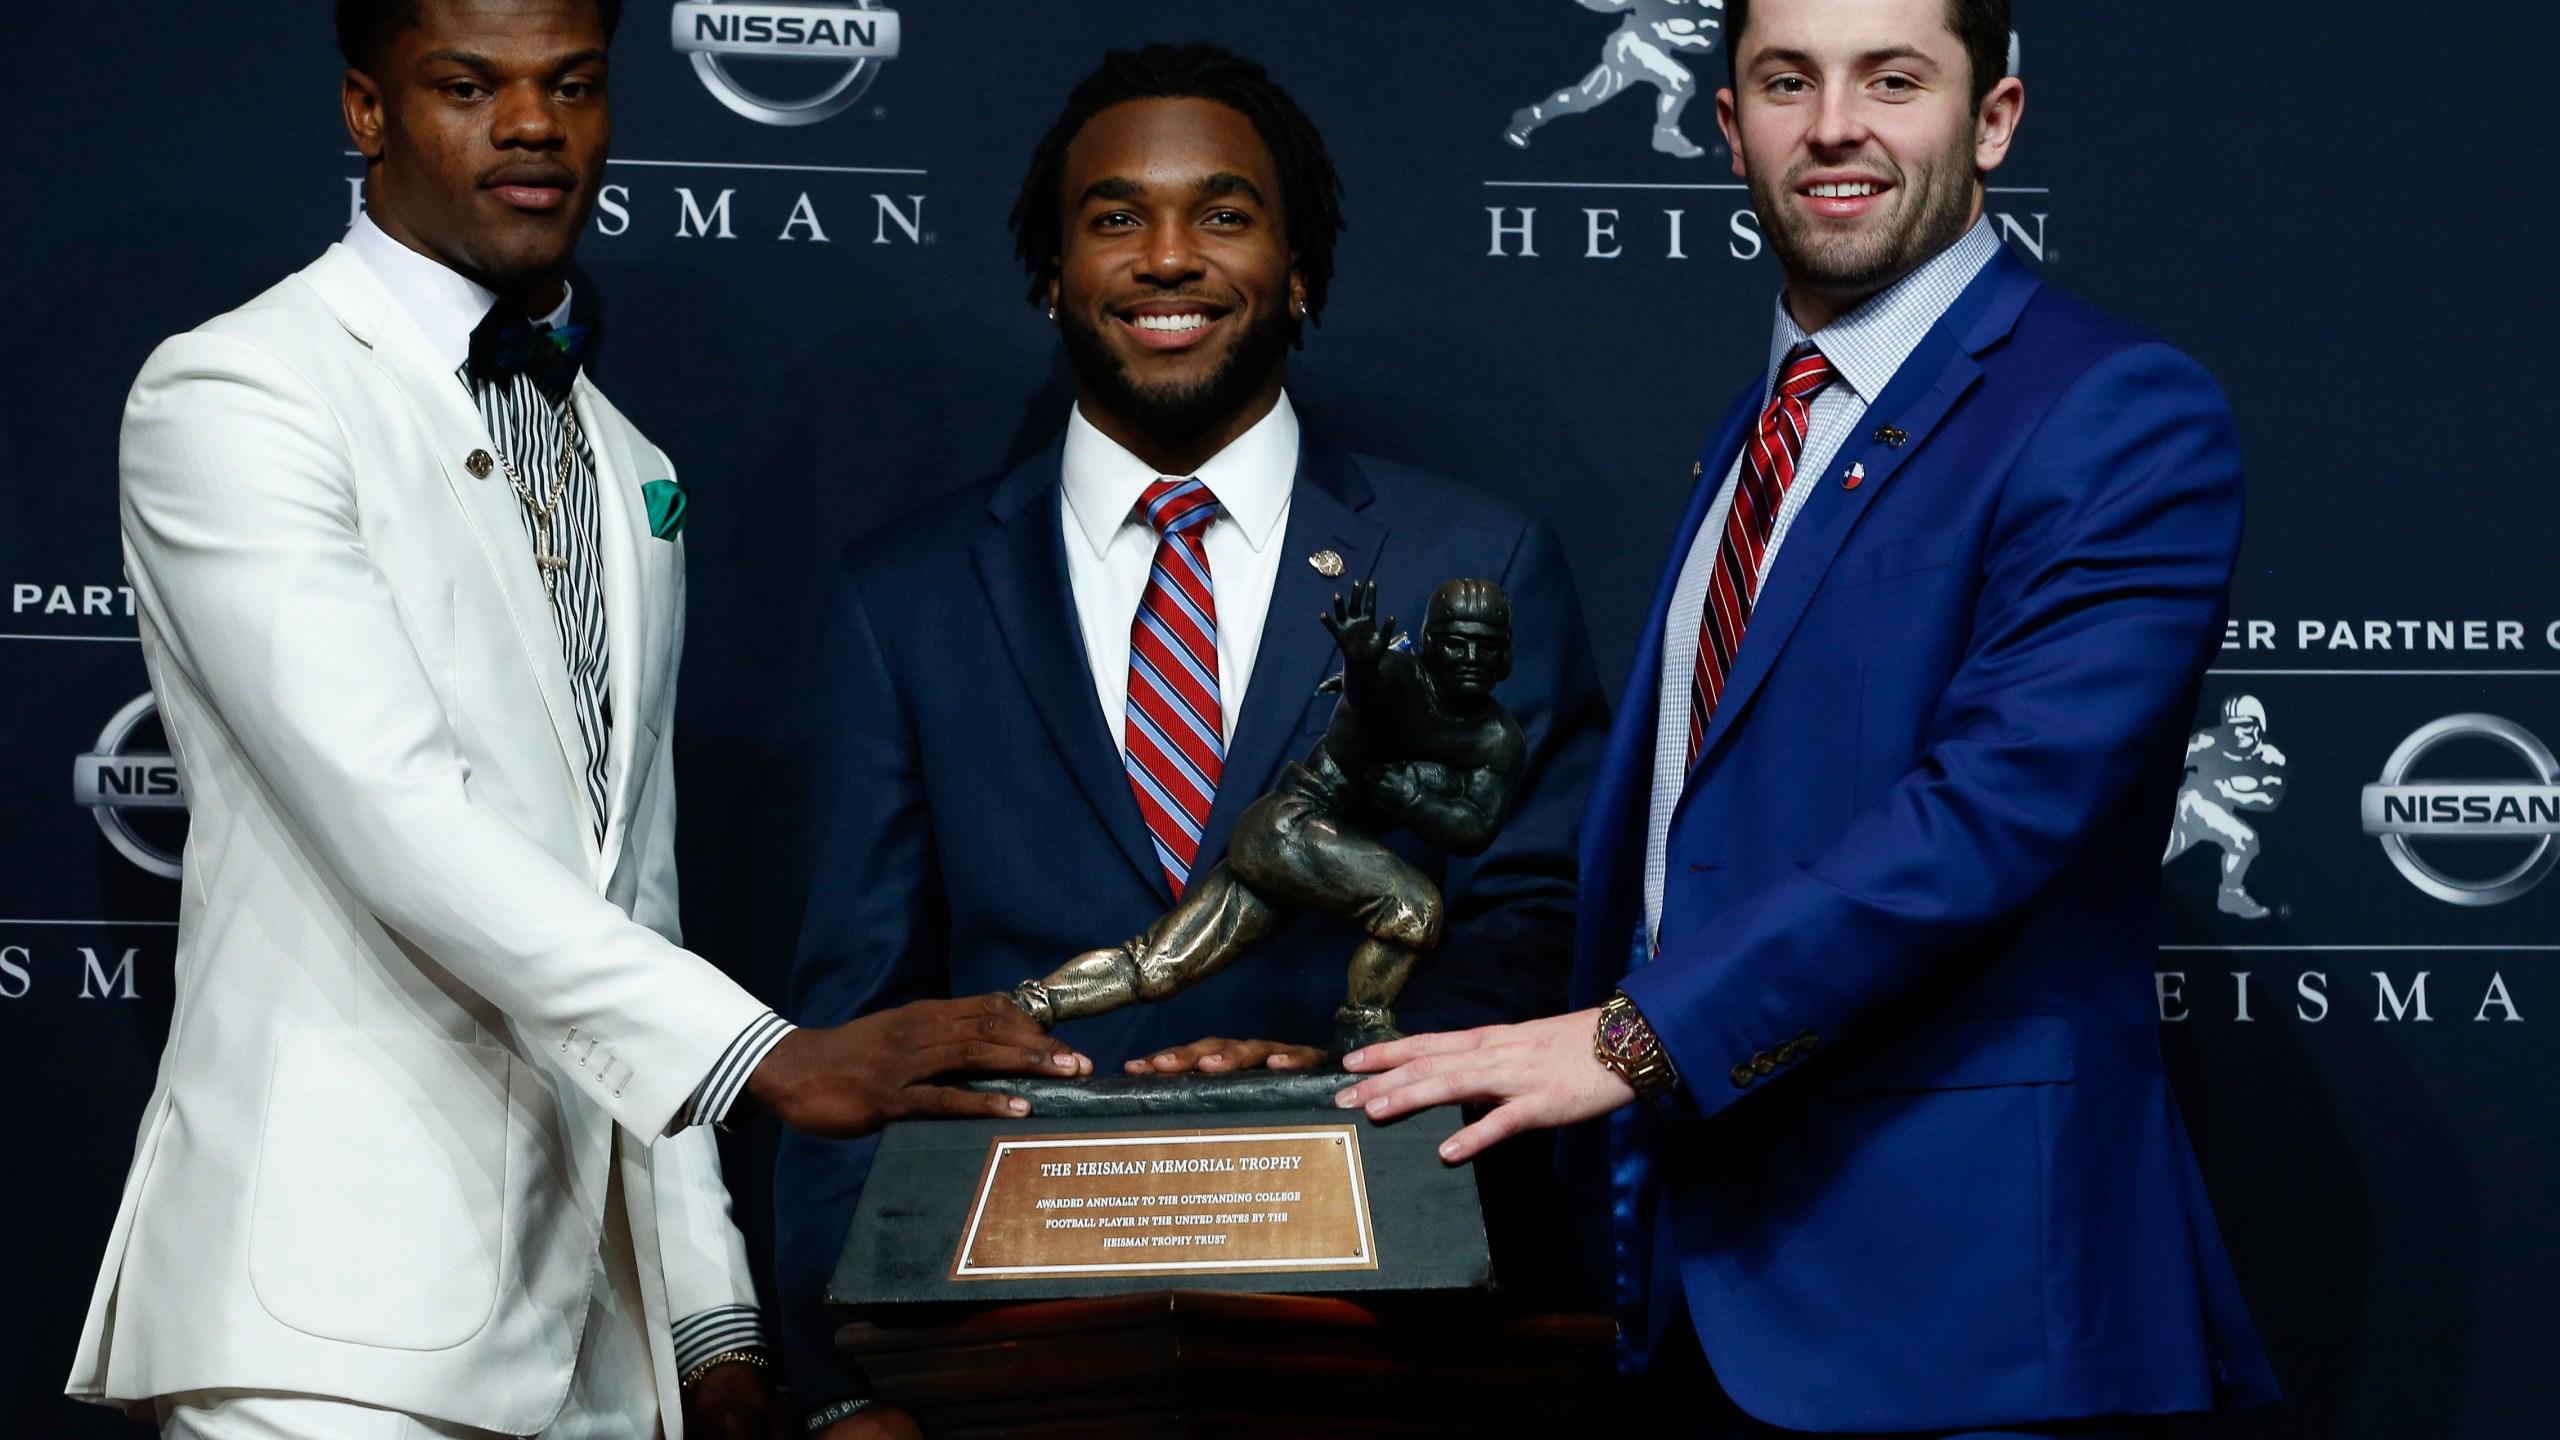 Heisman Trophy Presentation - Press Conference_595322